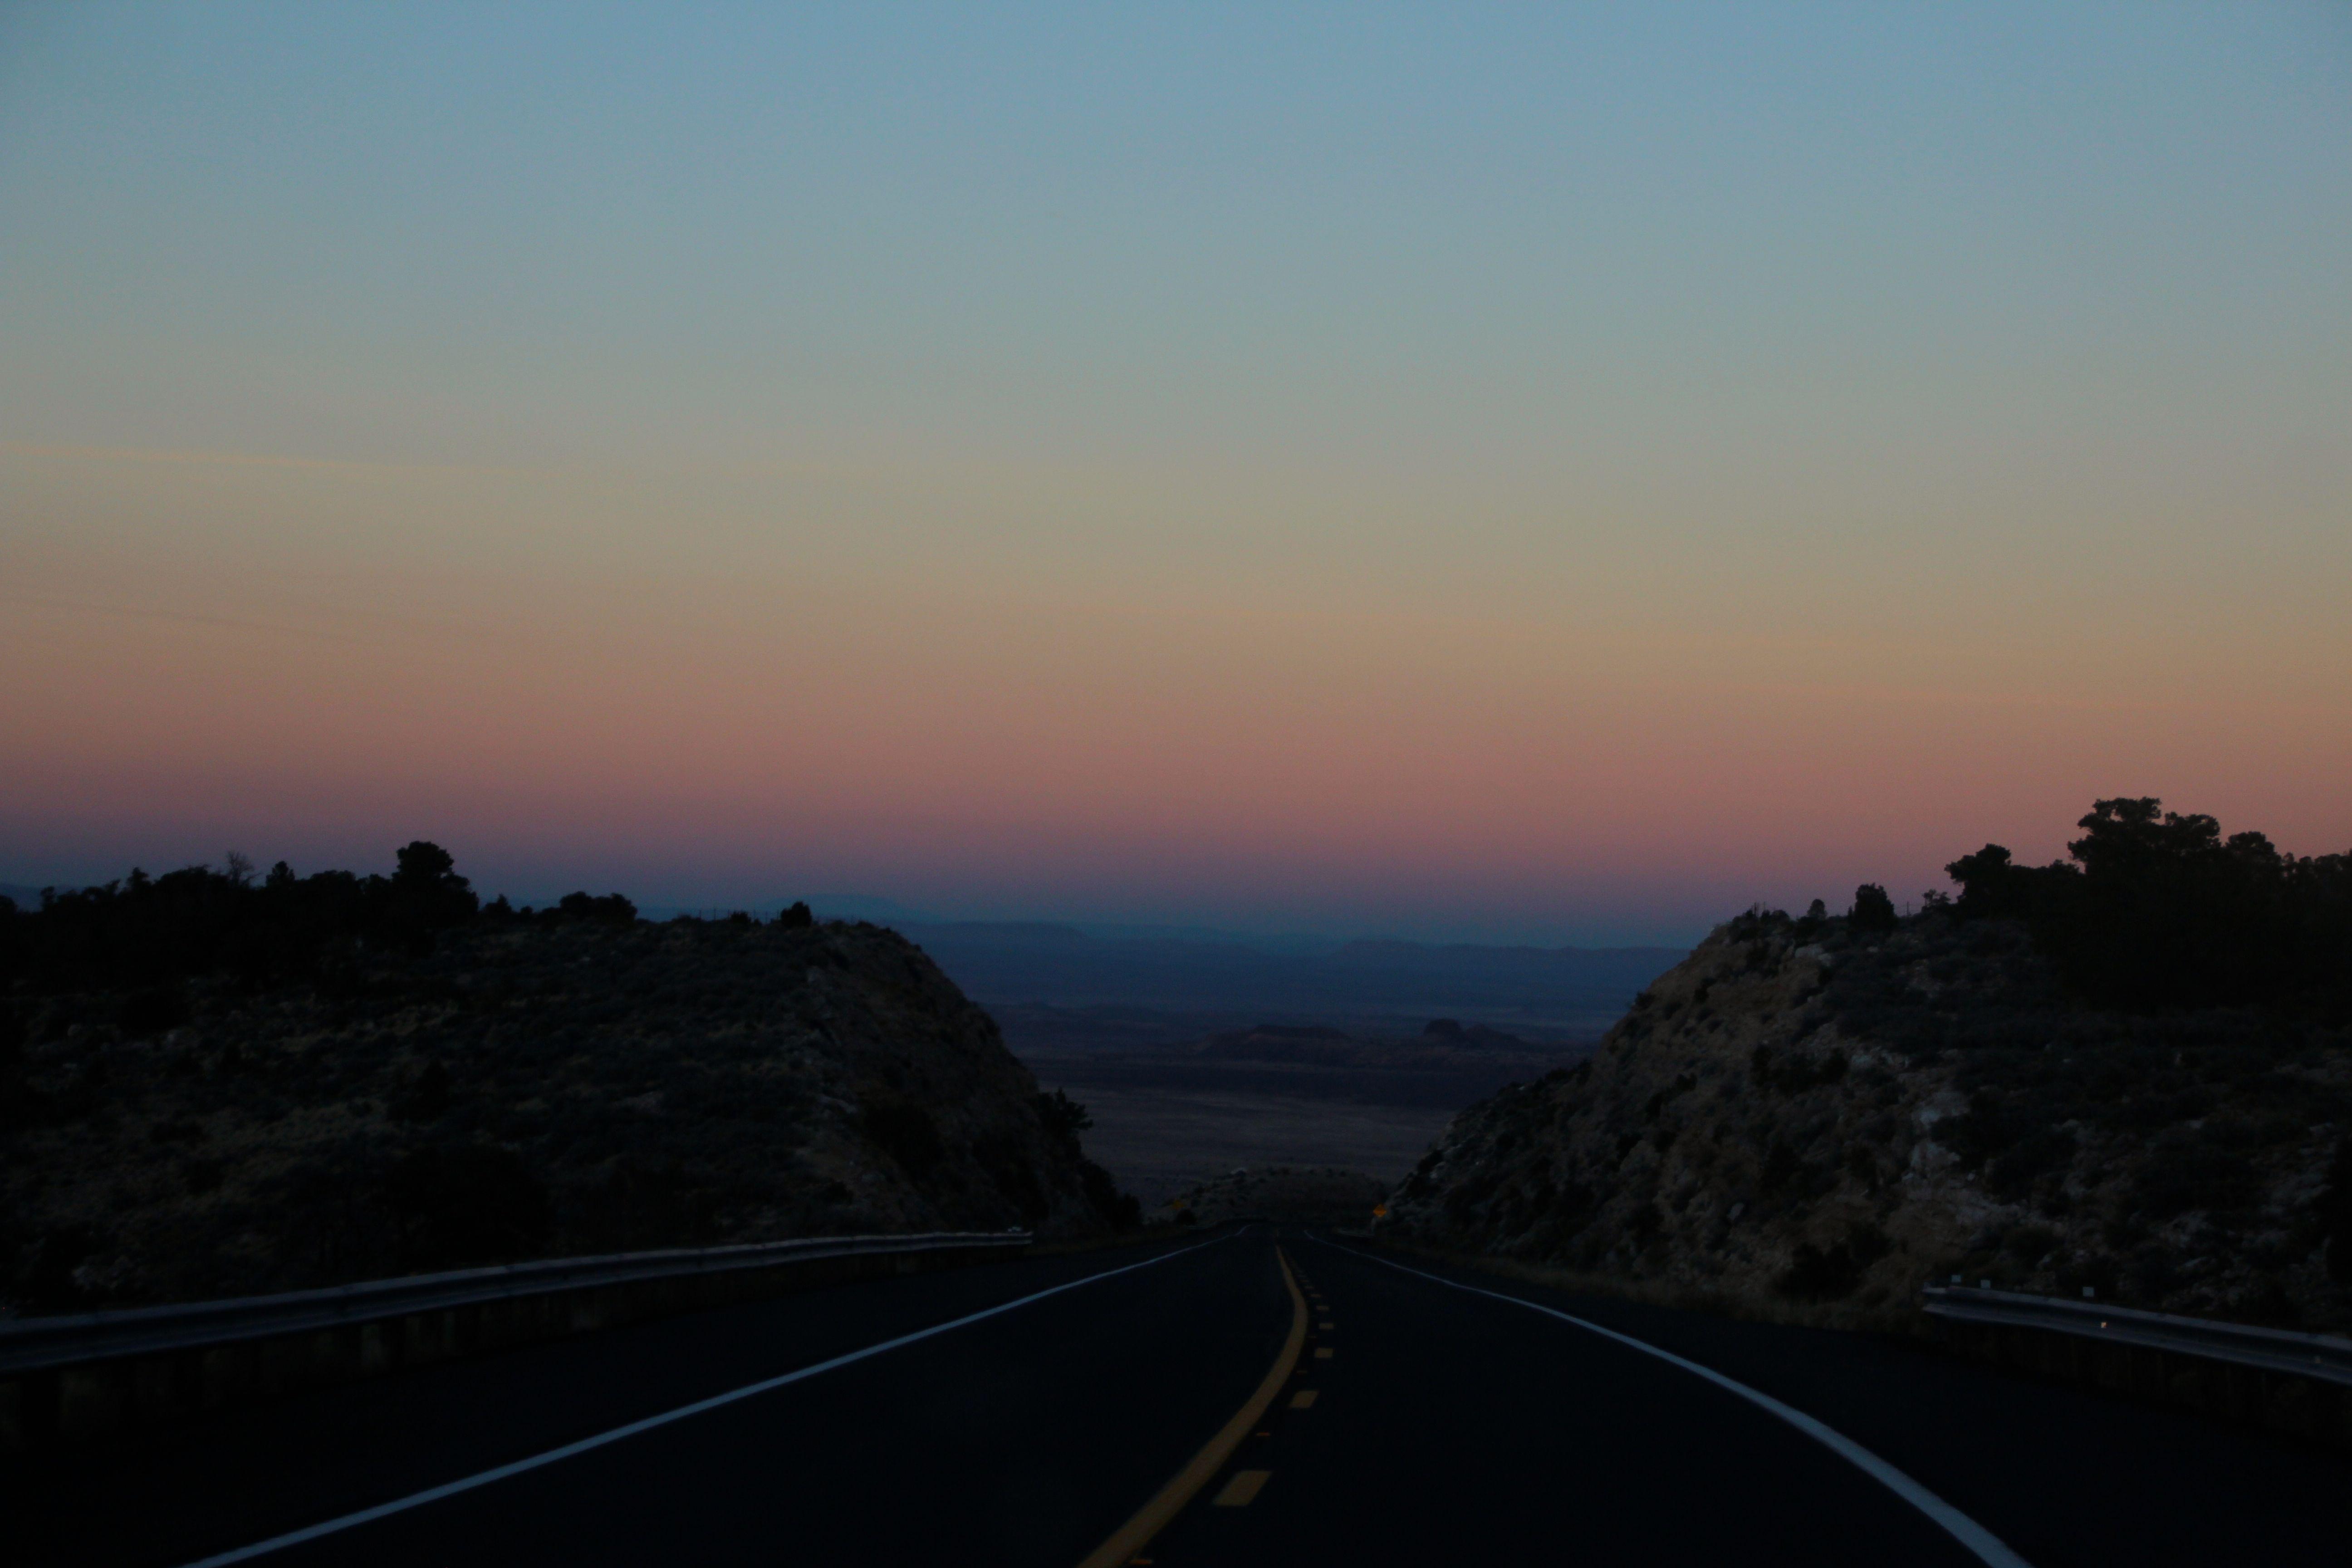 9 road trip sunset usa (c) upupup.fr